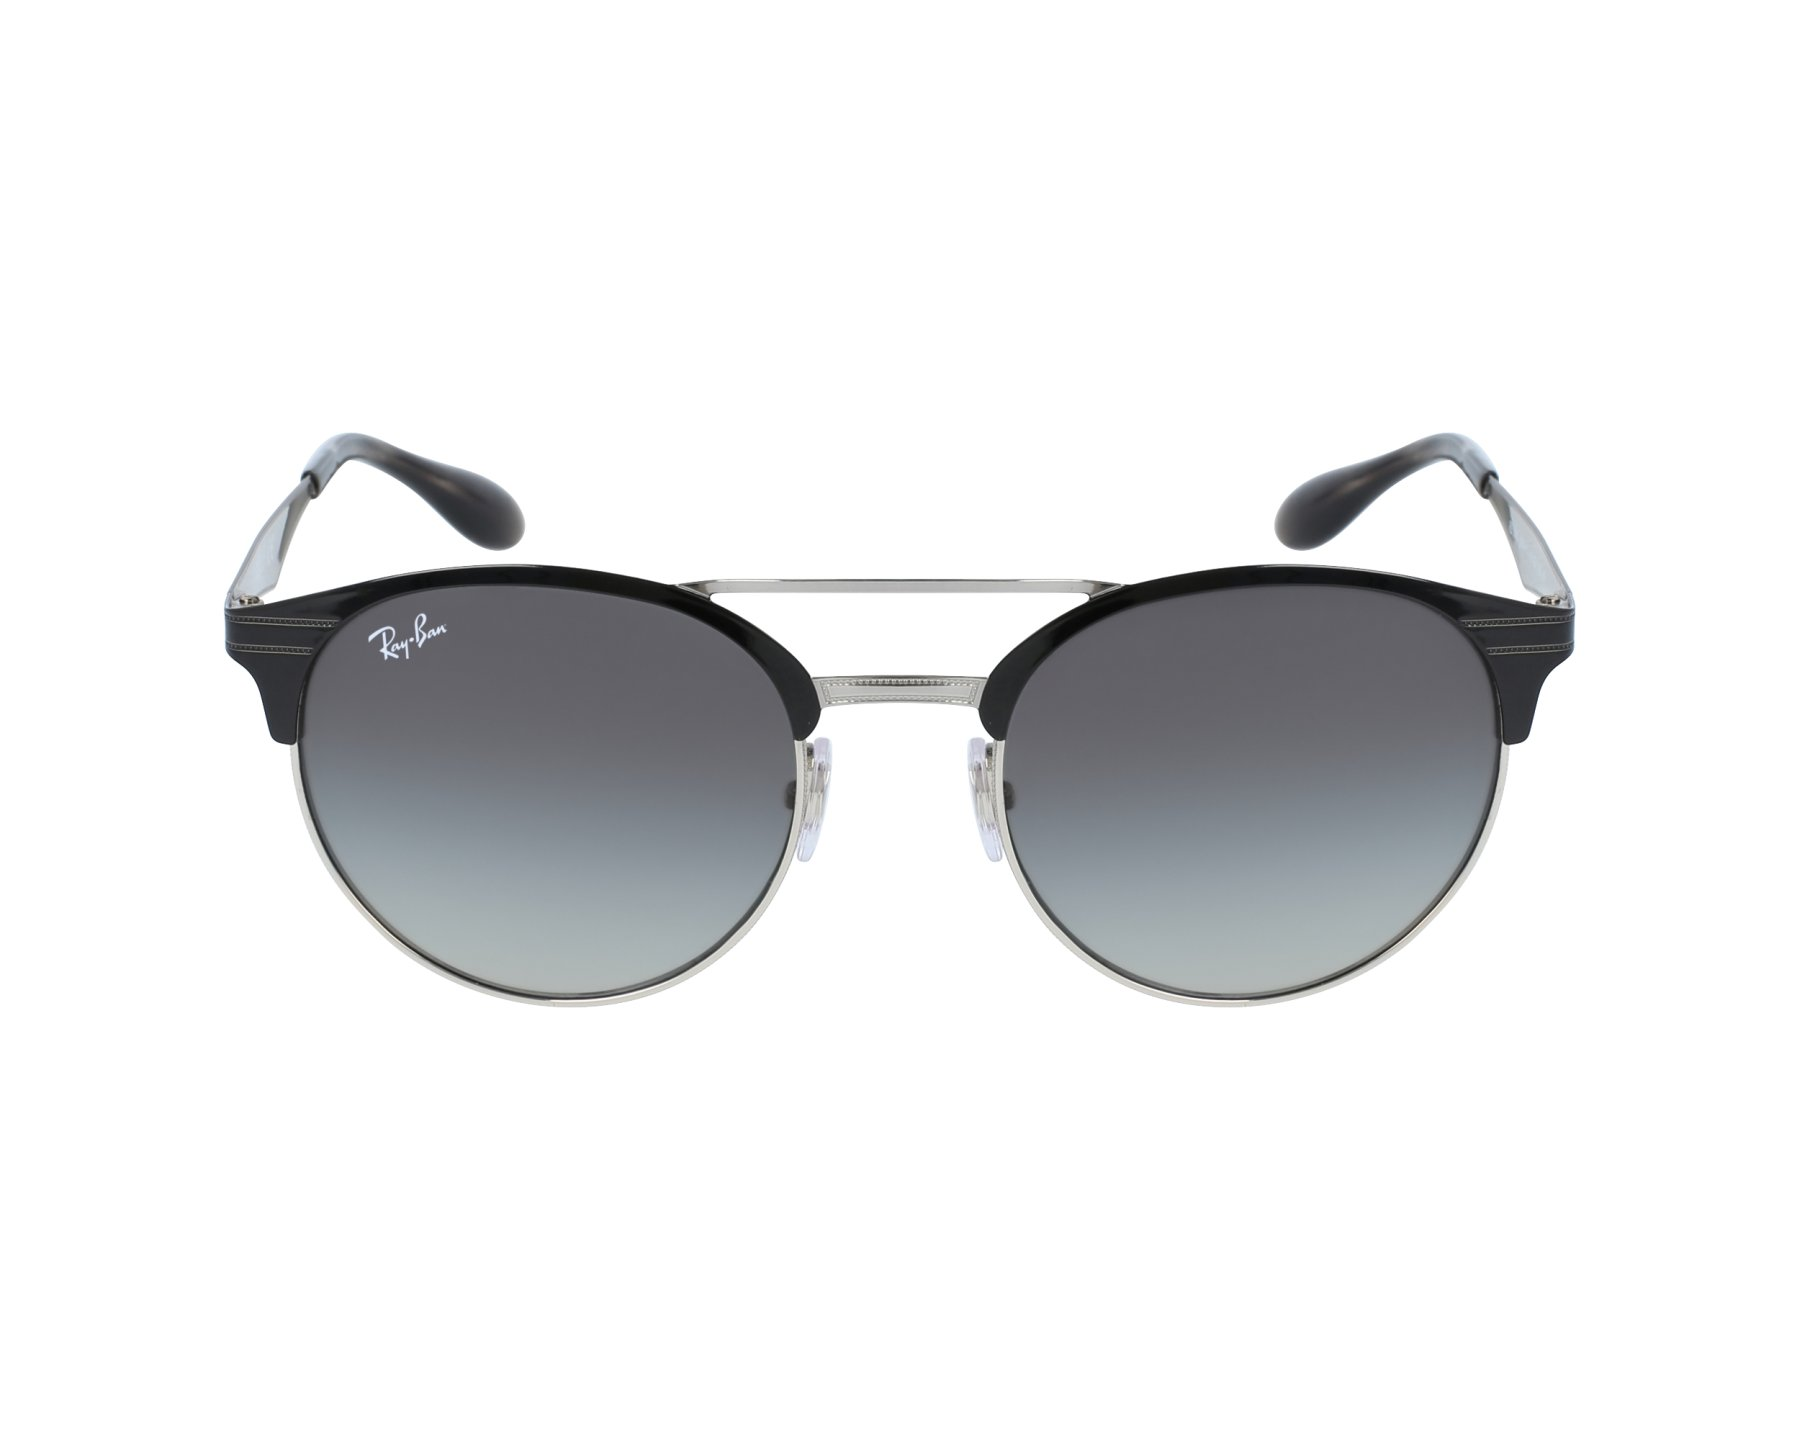 Ray-Ban Sonnenbrille RB3545 1magQHQ6